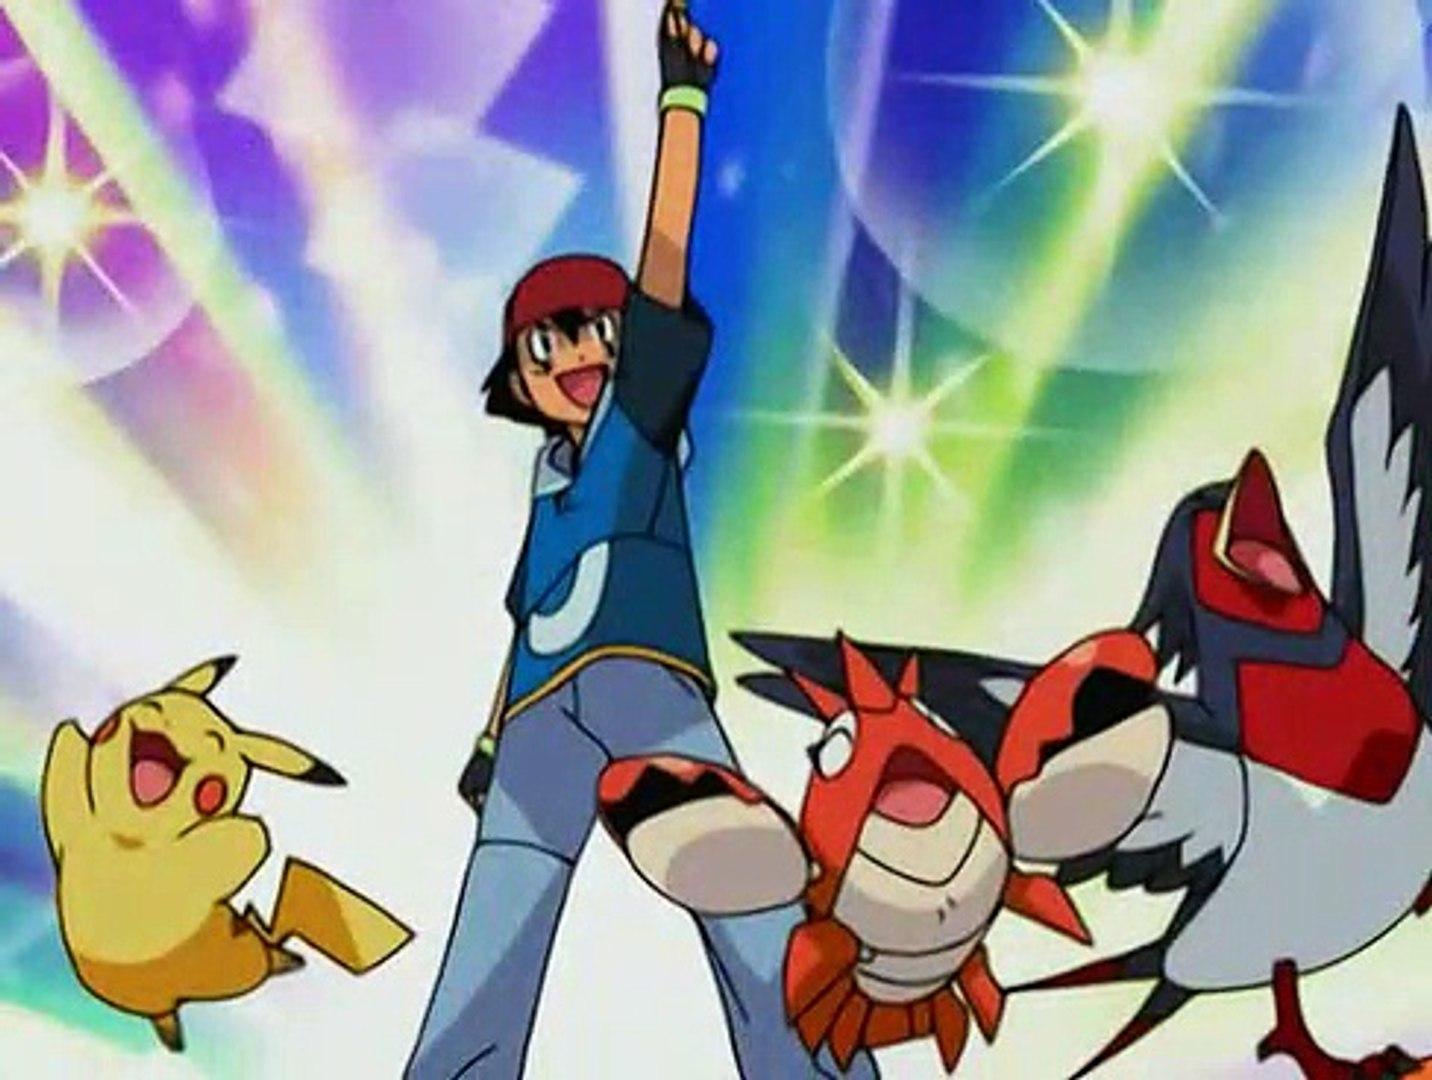 Pokemon - 429 - On Olden Pond! - Dailymotion Video